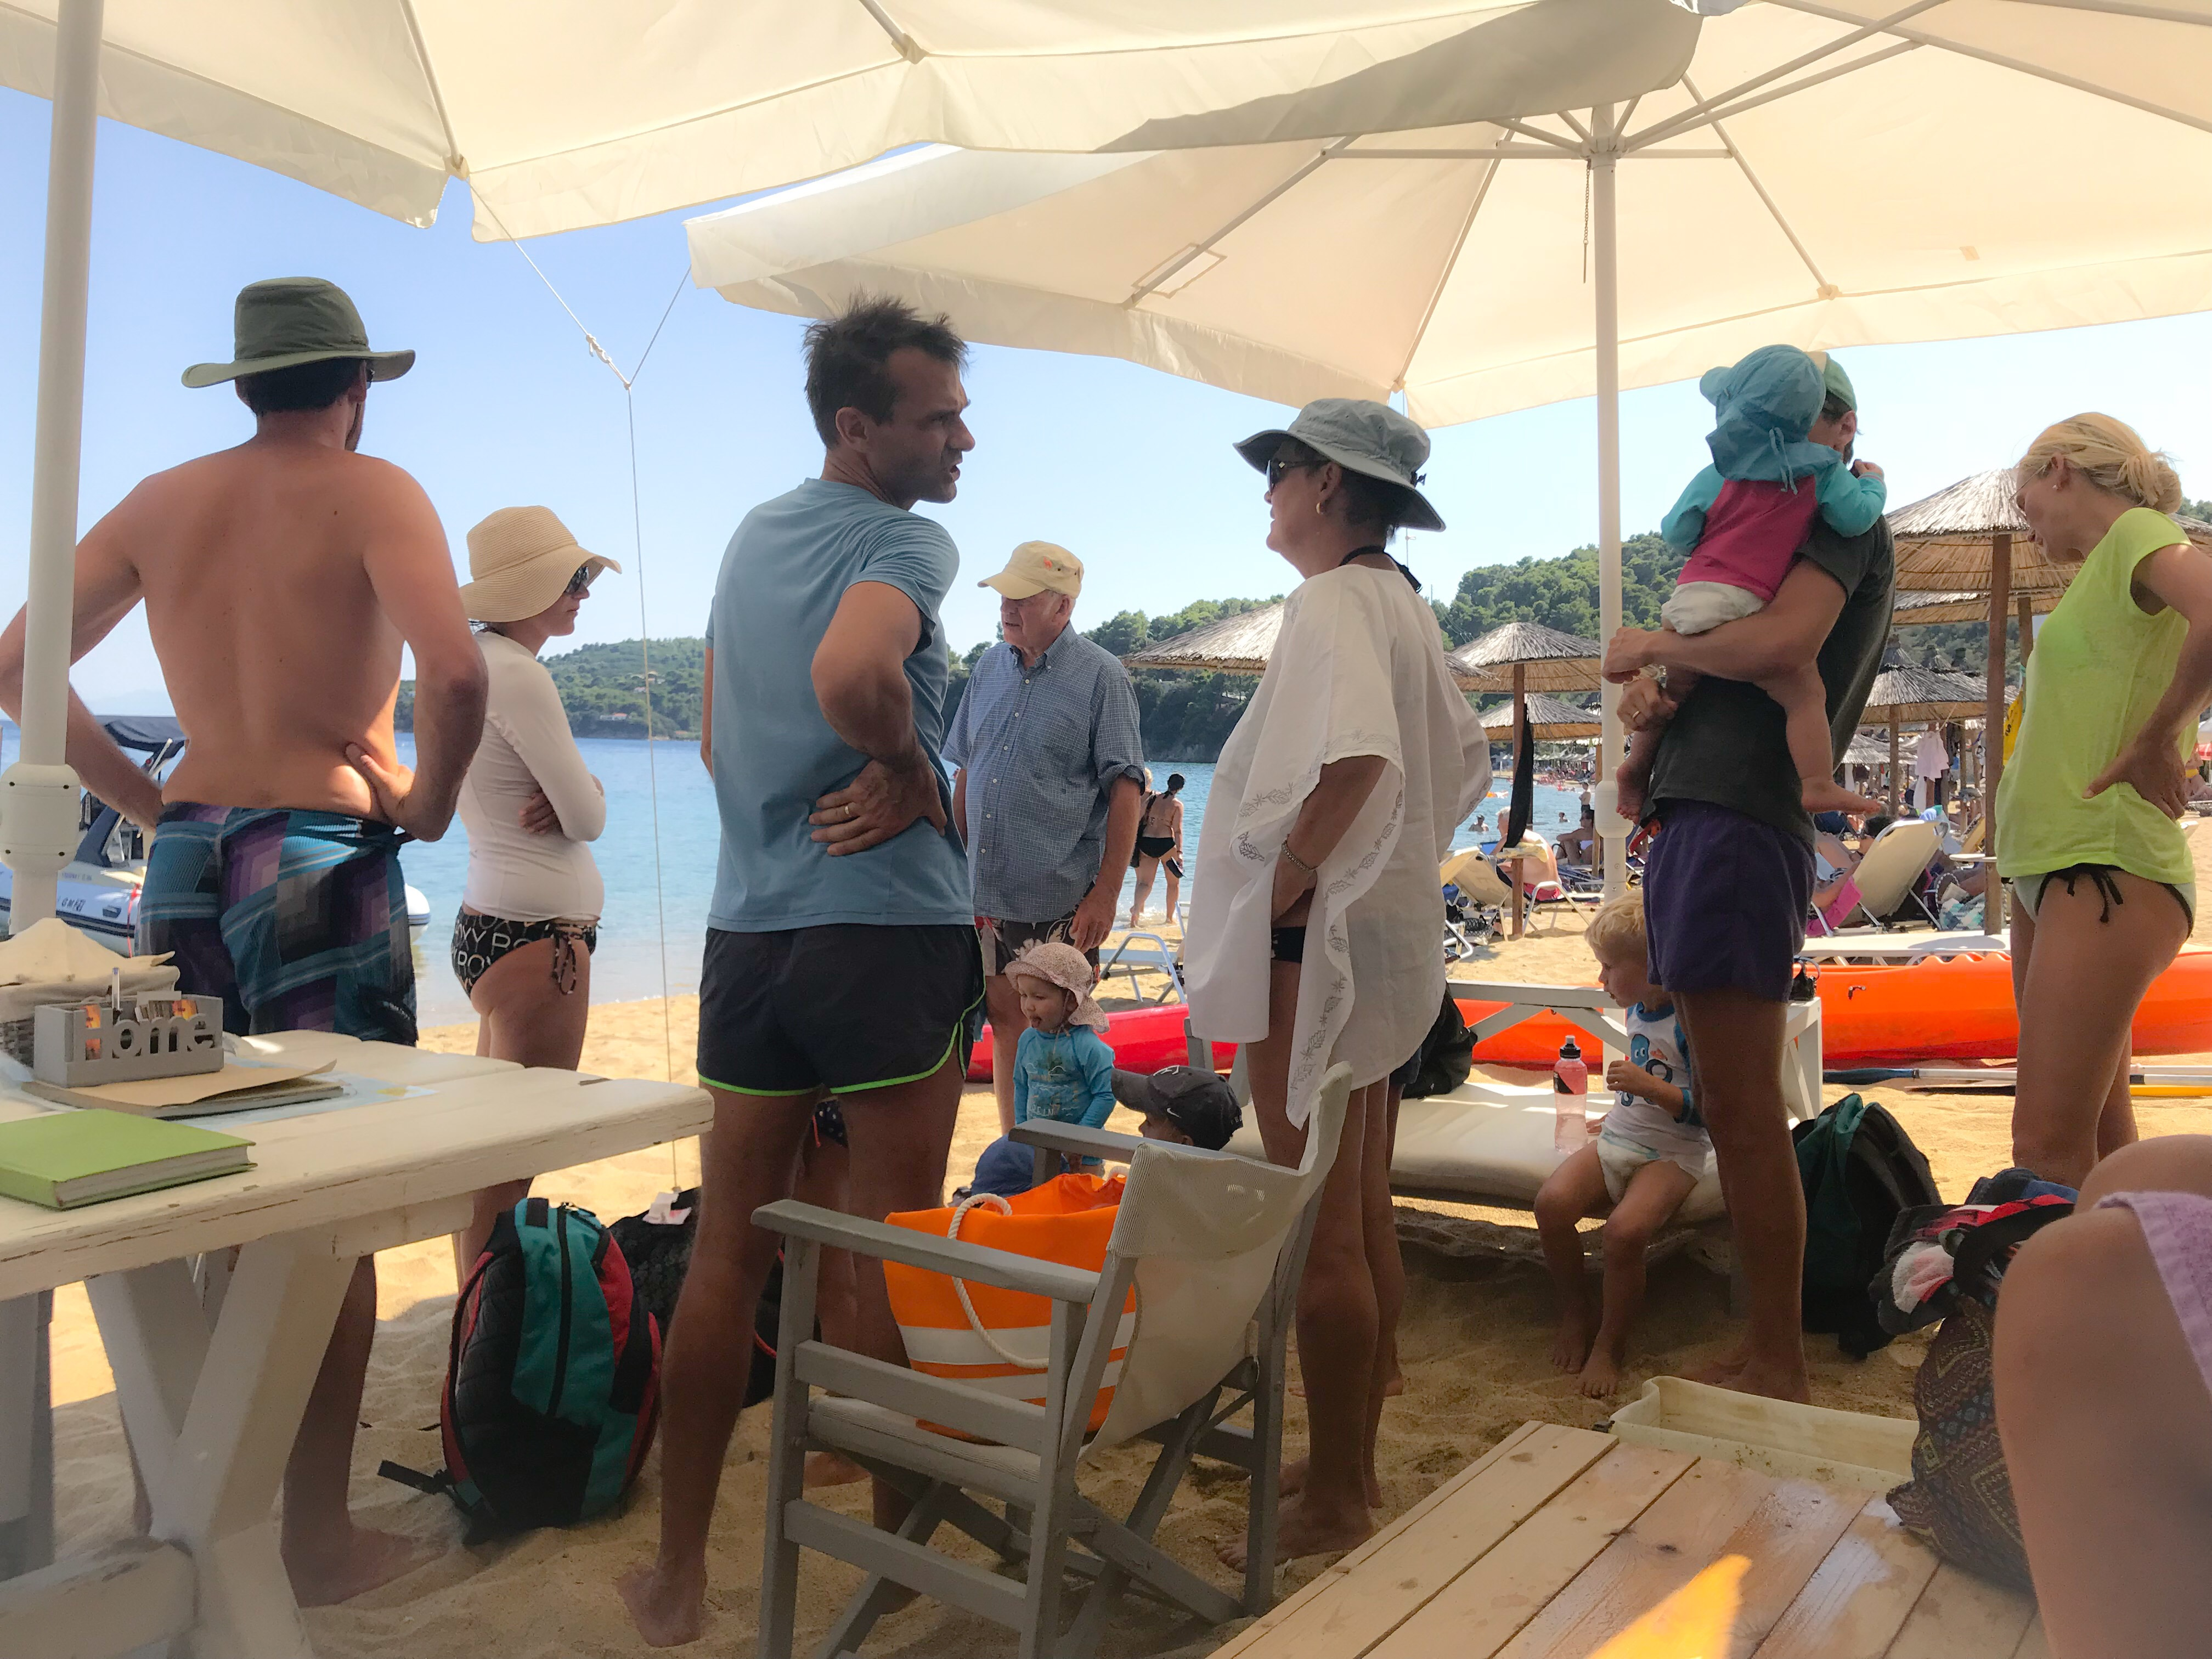 skiathos rent boats,skiathos boats for hire,polyester,skiathos island,skiathos boats,skiathos fun